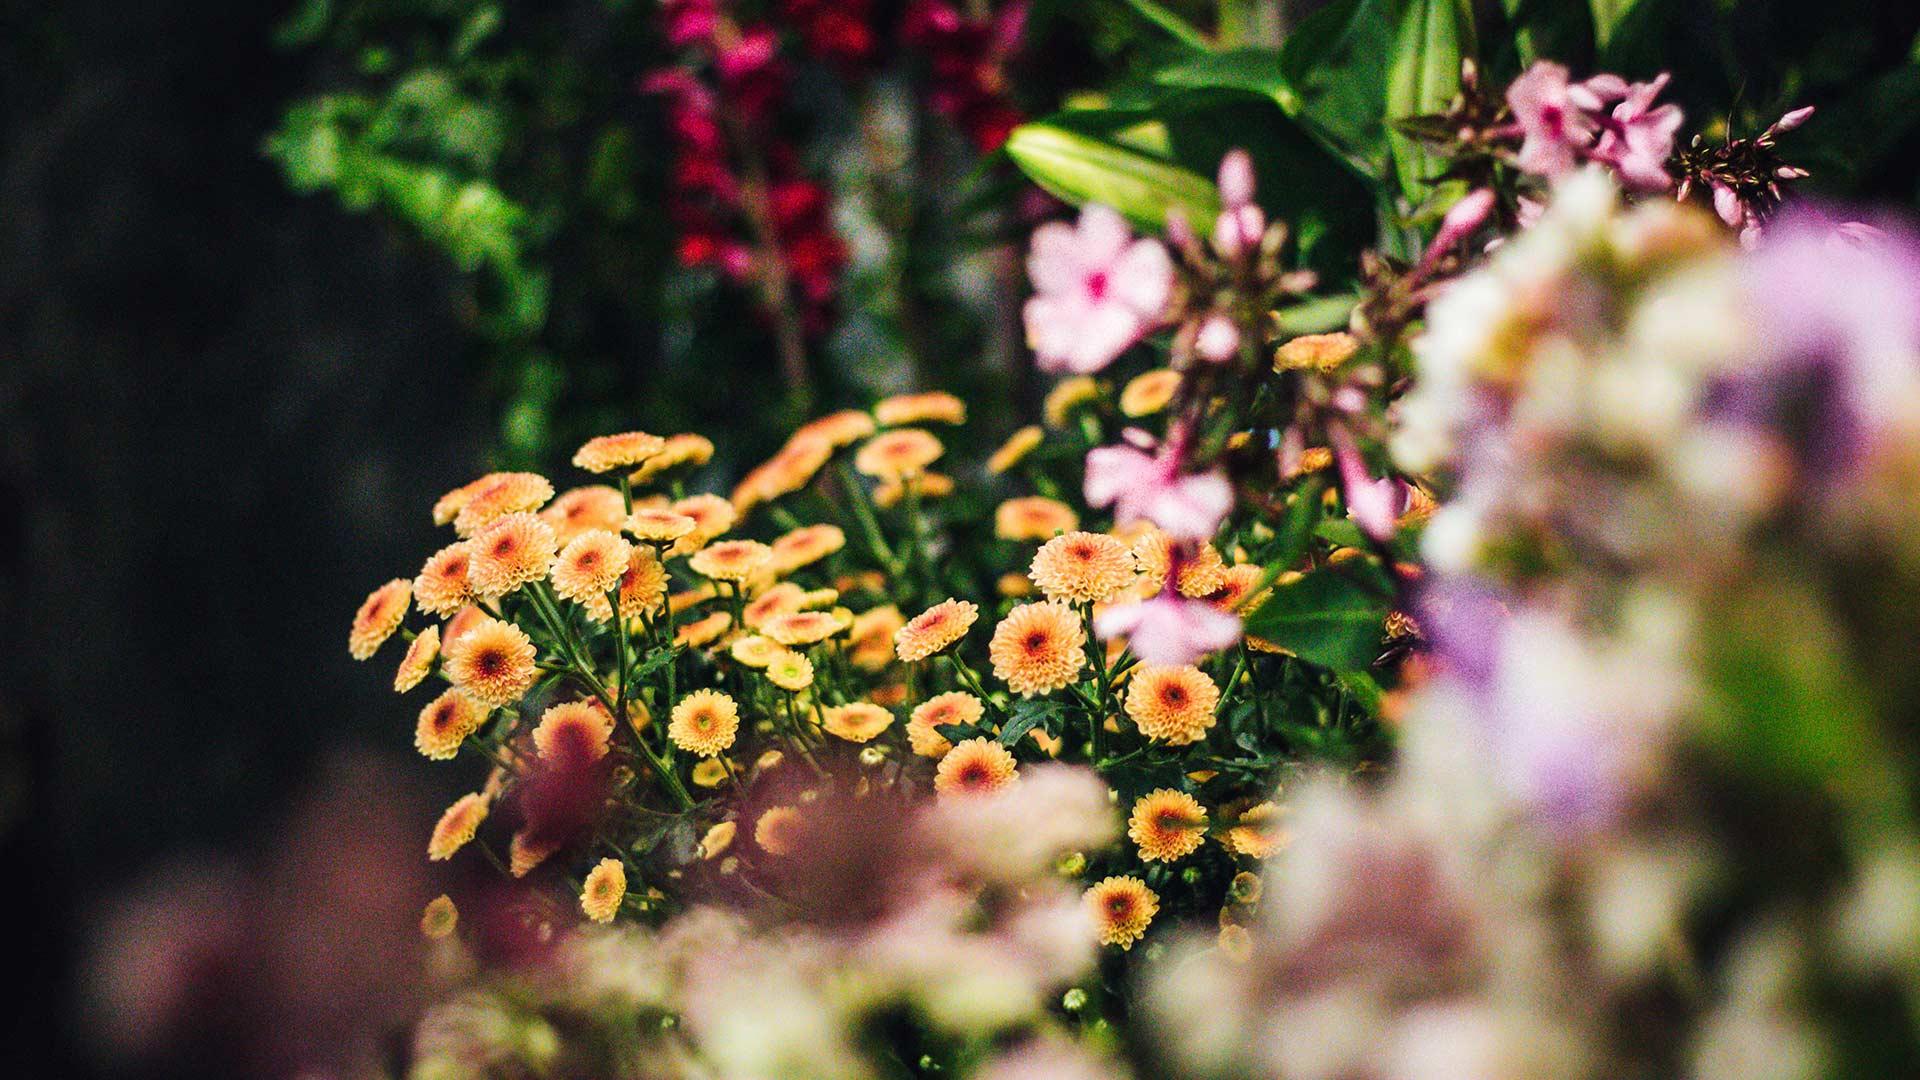 Erica Berry Flowers